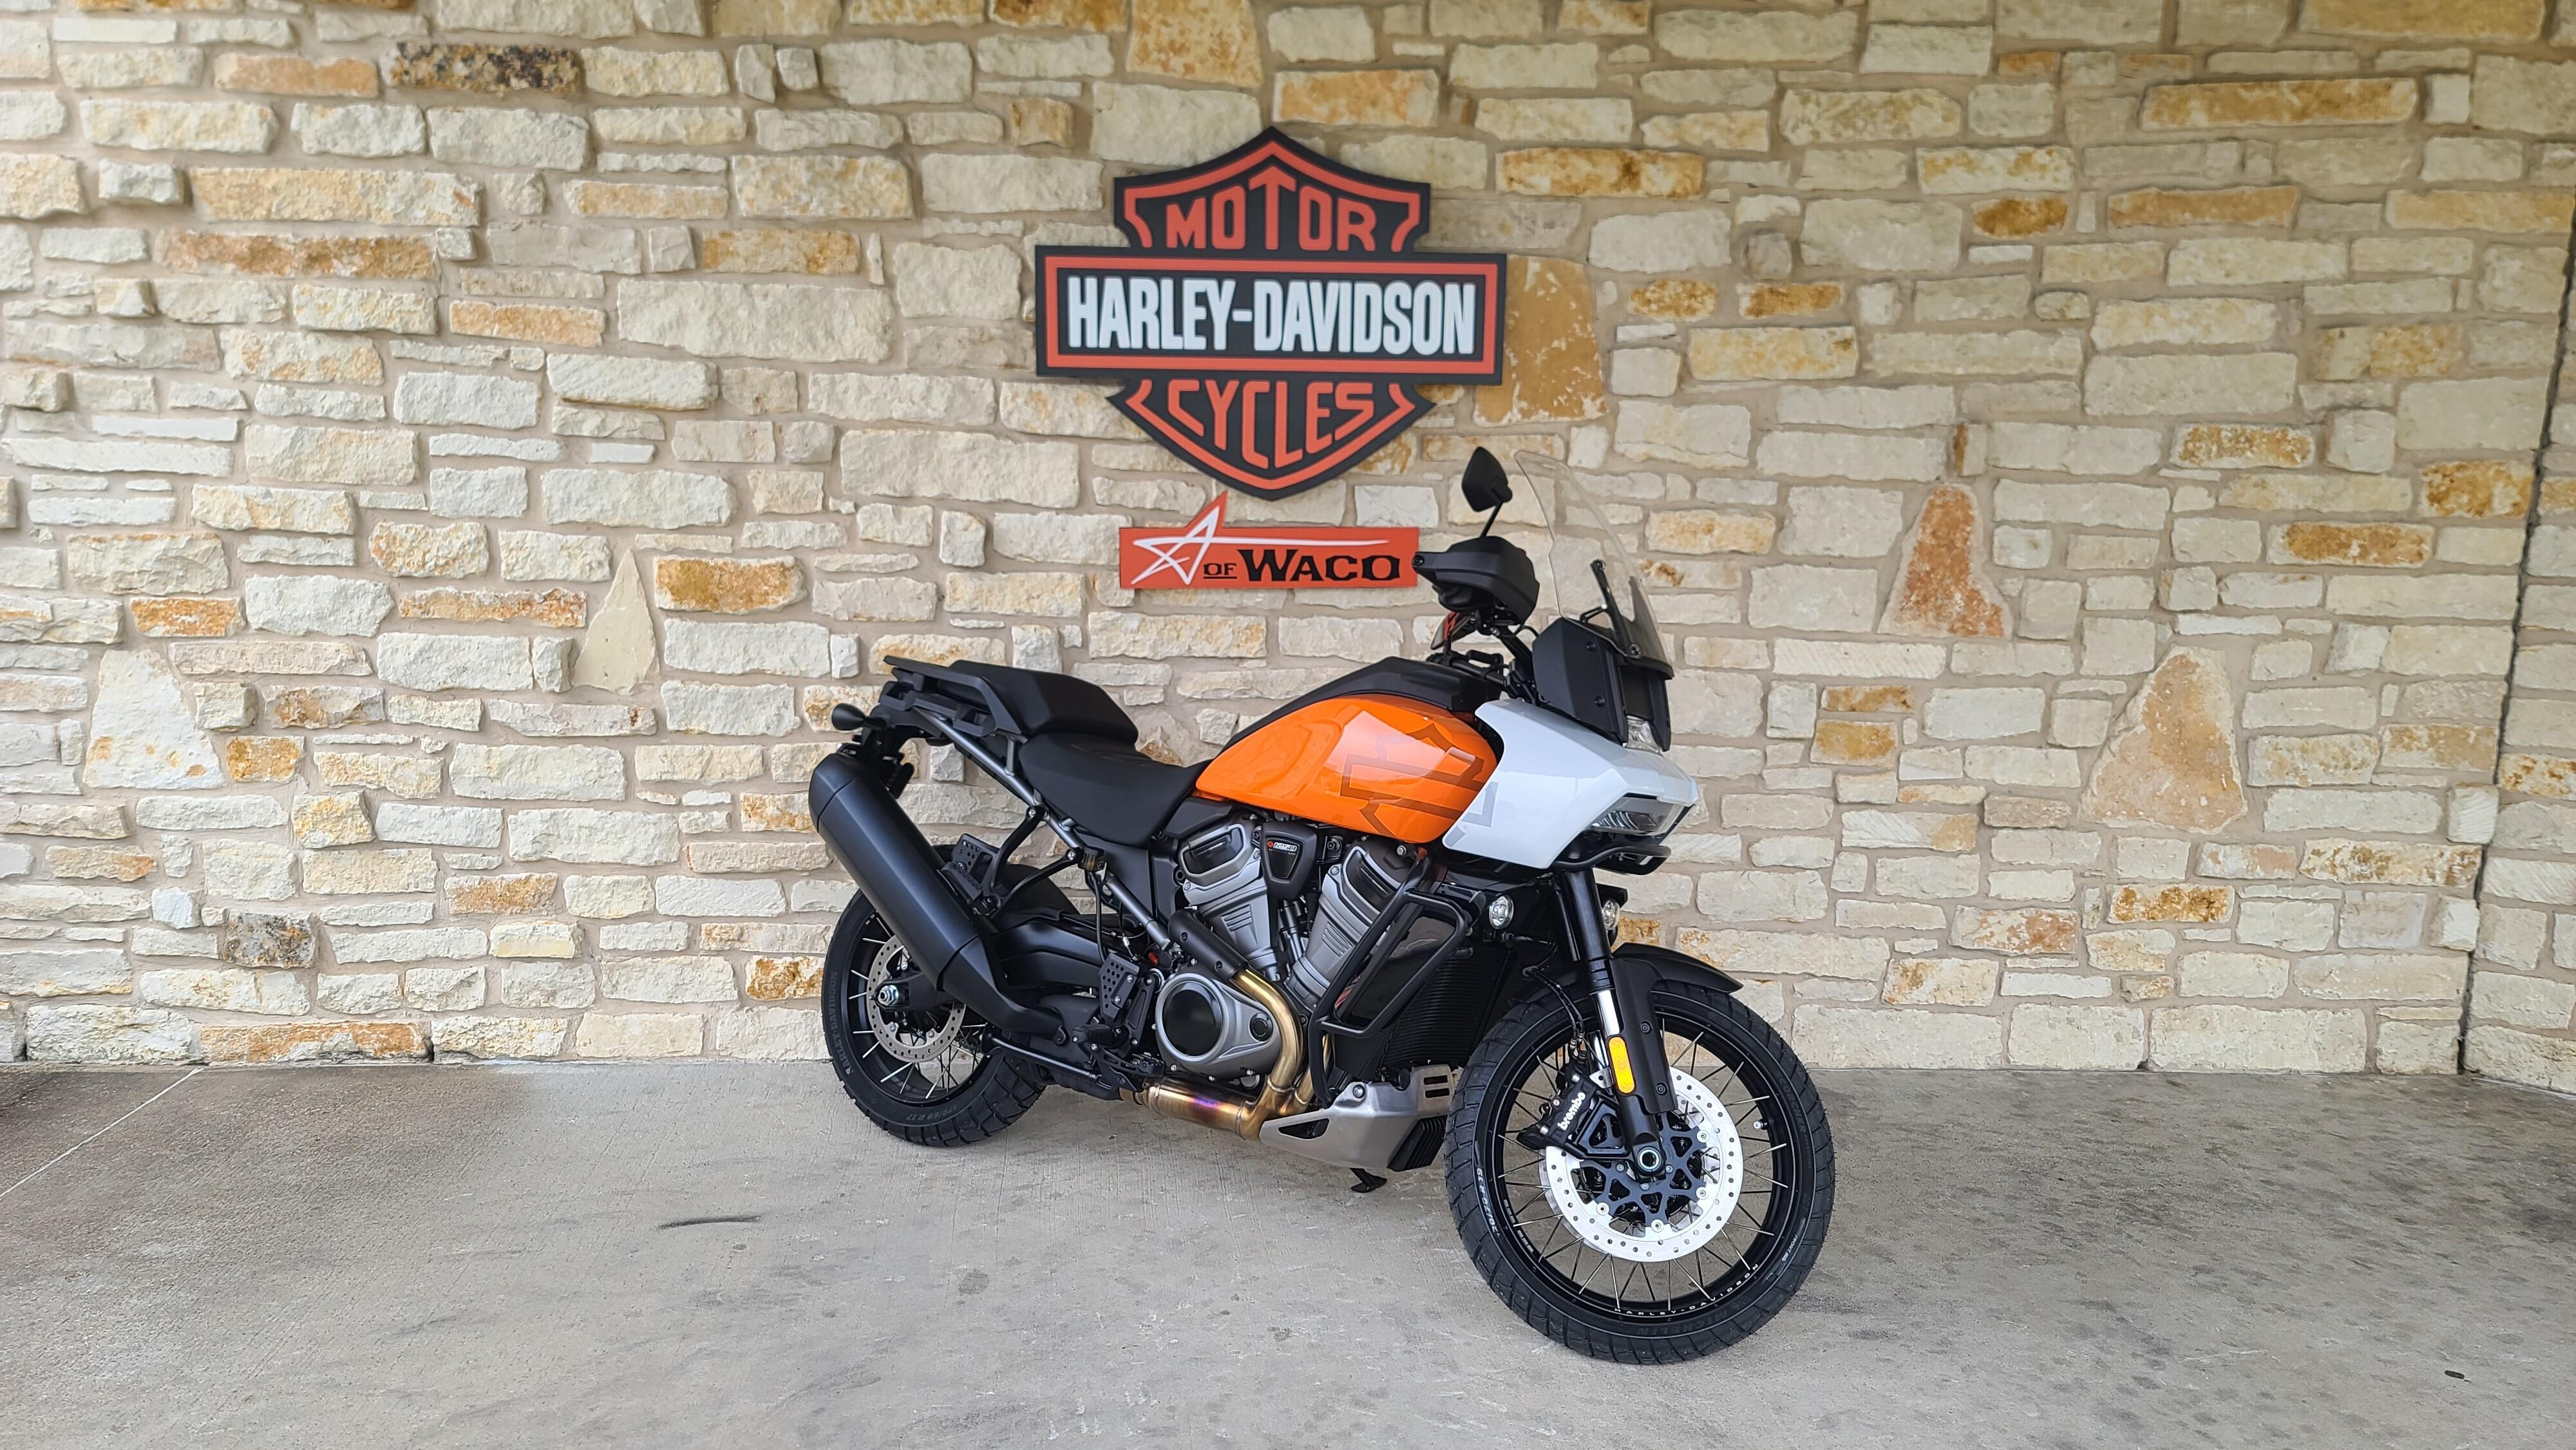 2021 Harley-Davidson Pan America Pan America 1250 Special at Harley-Davidson of Waco